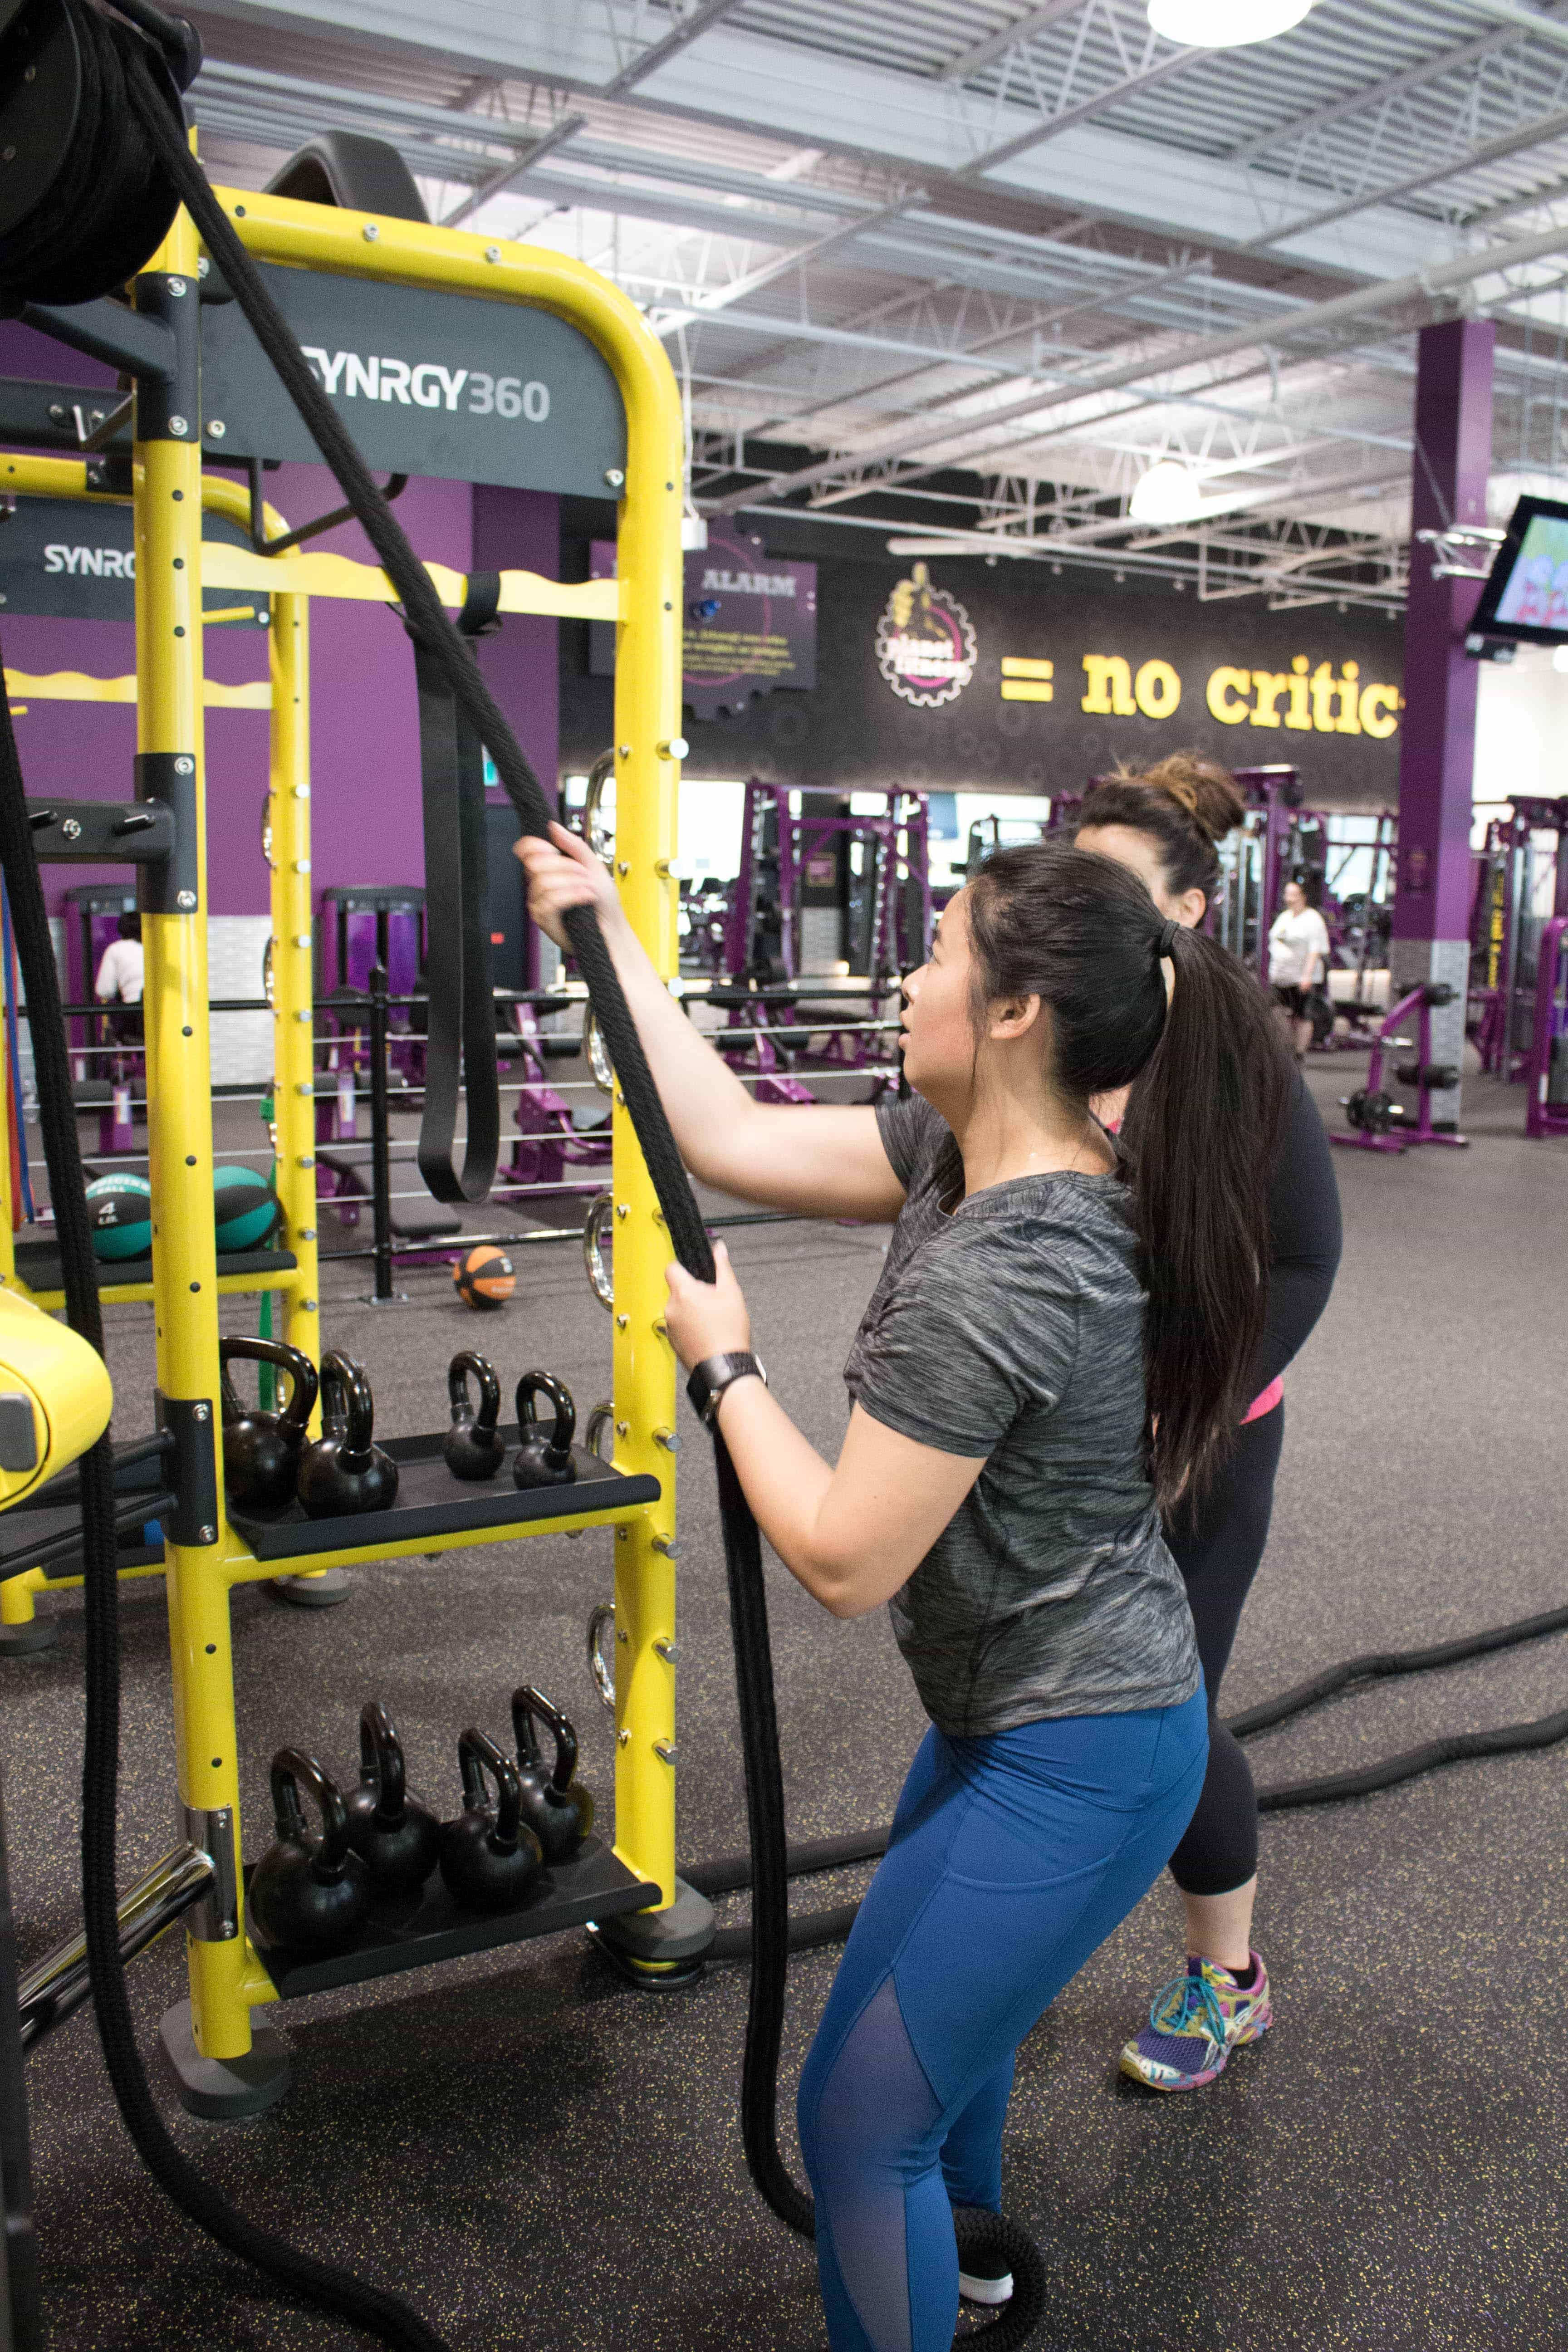 Planet Fitness Yakima Wa : planet, fitness, yakima, Introducing, Planet, Fitness., Frills,, Judgement,, Gerrard, Square,, Toronto., Carmy, Travel